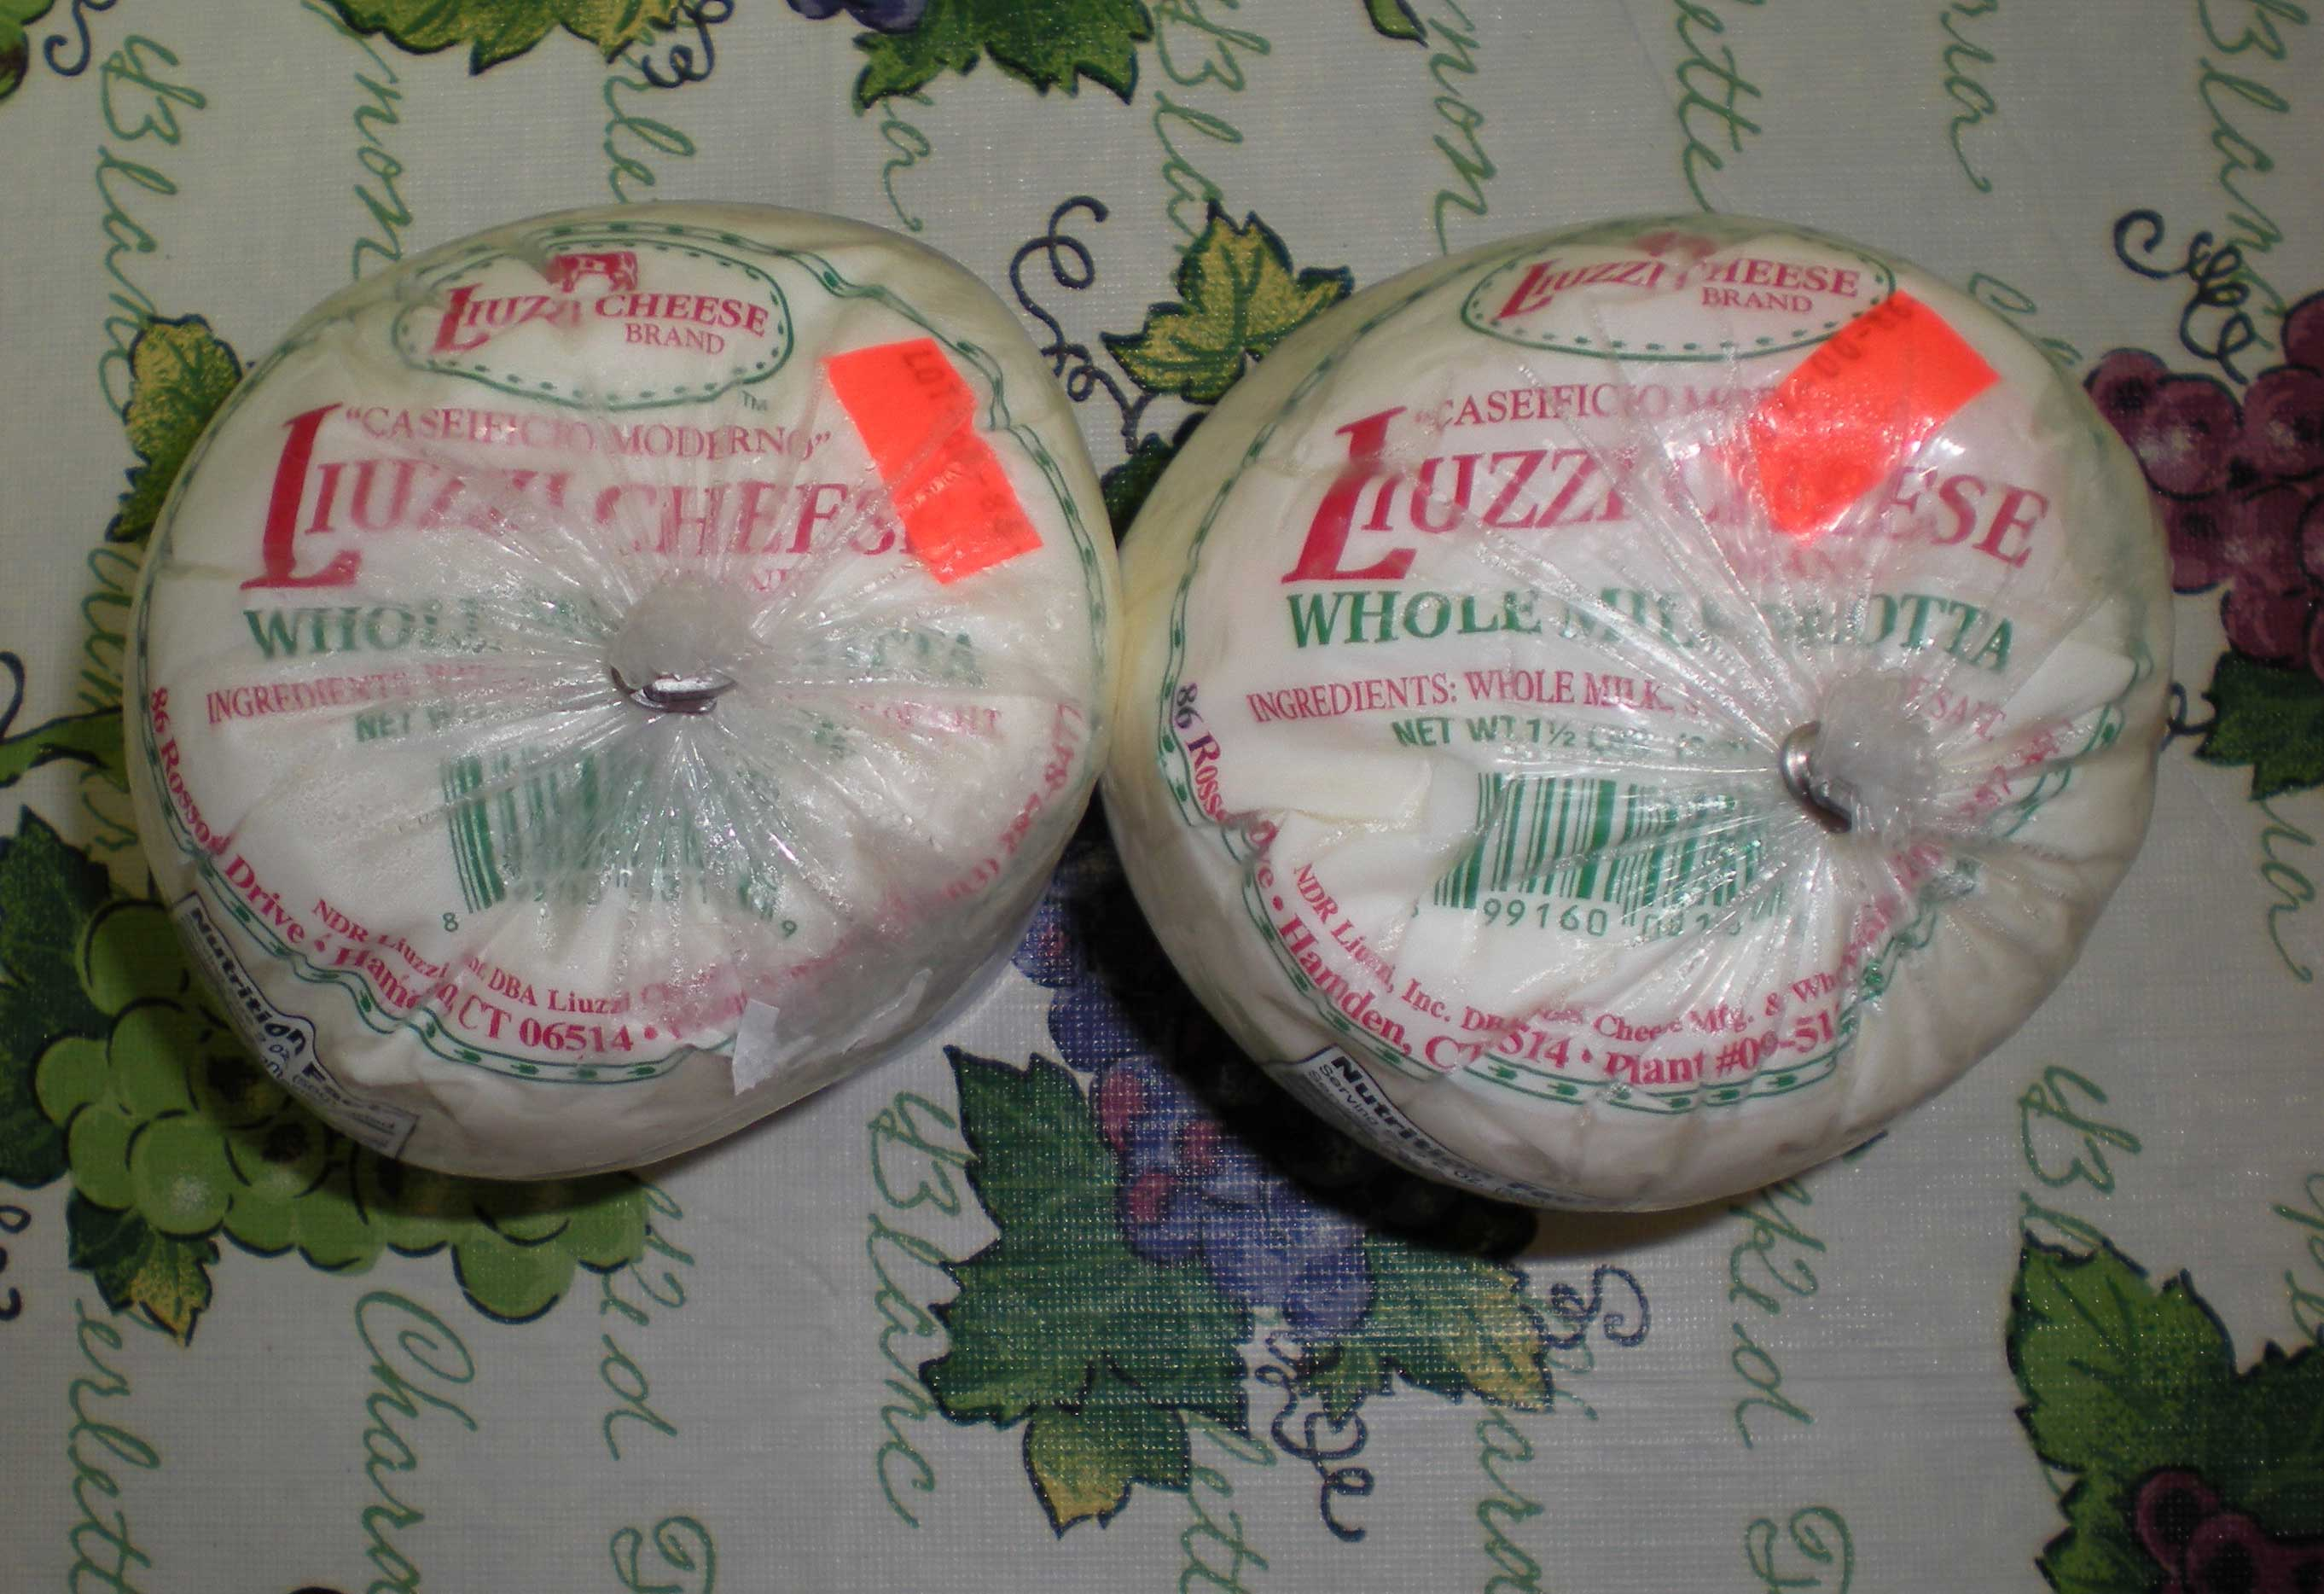 Liuzzi Cheese Ricotta